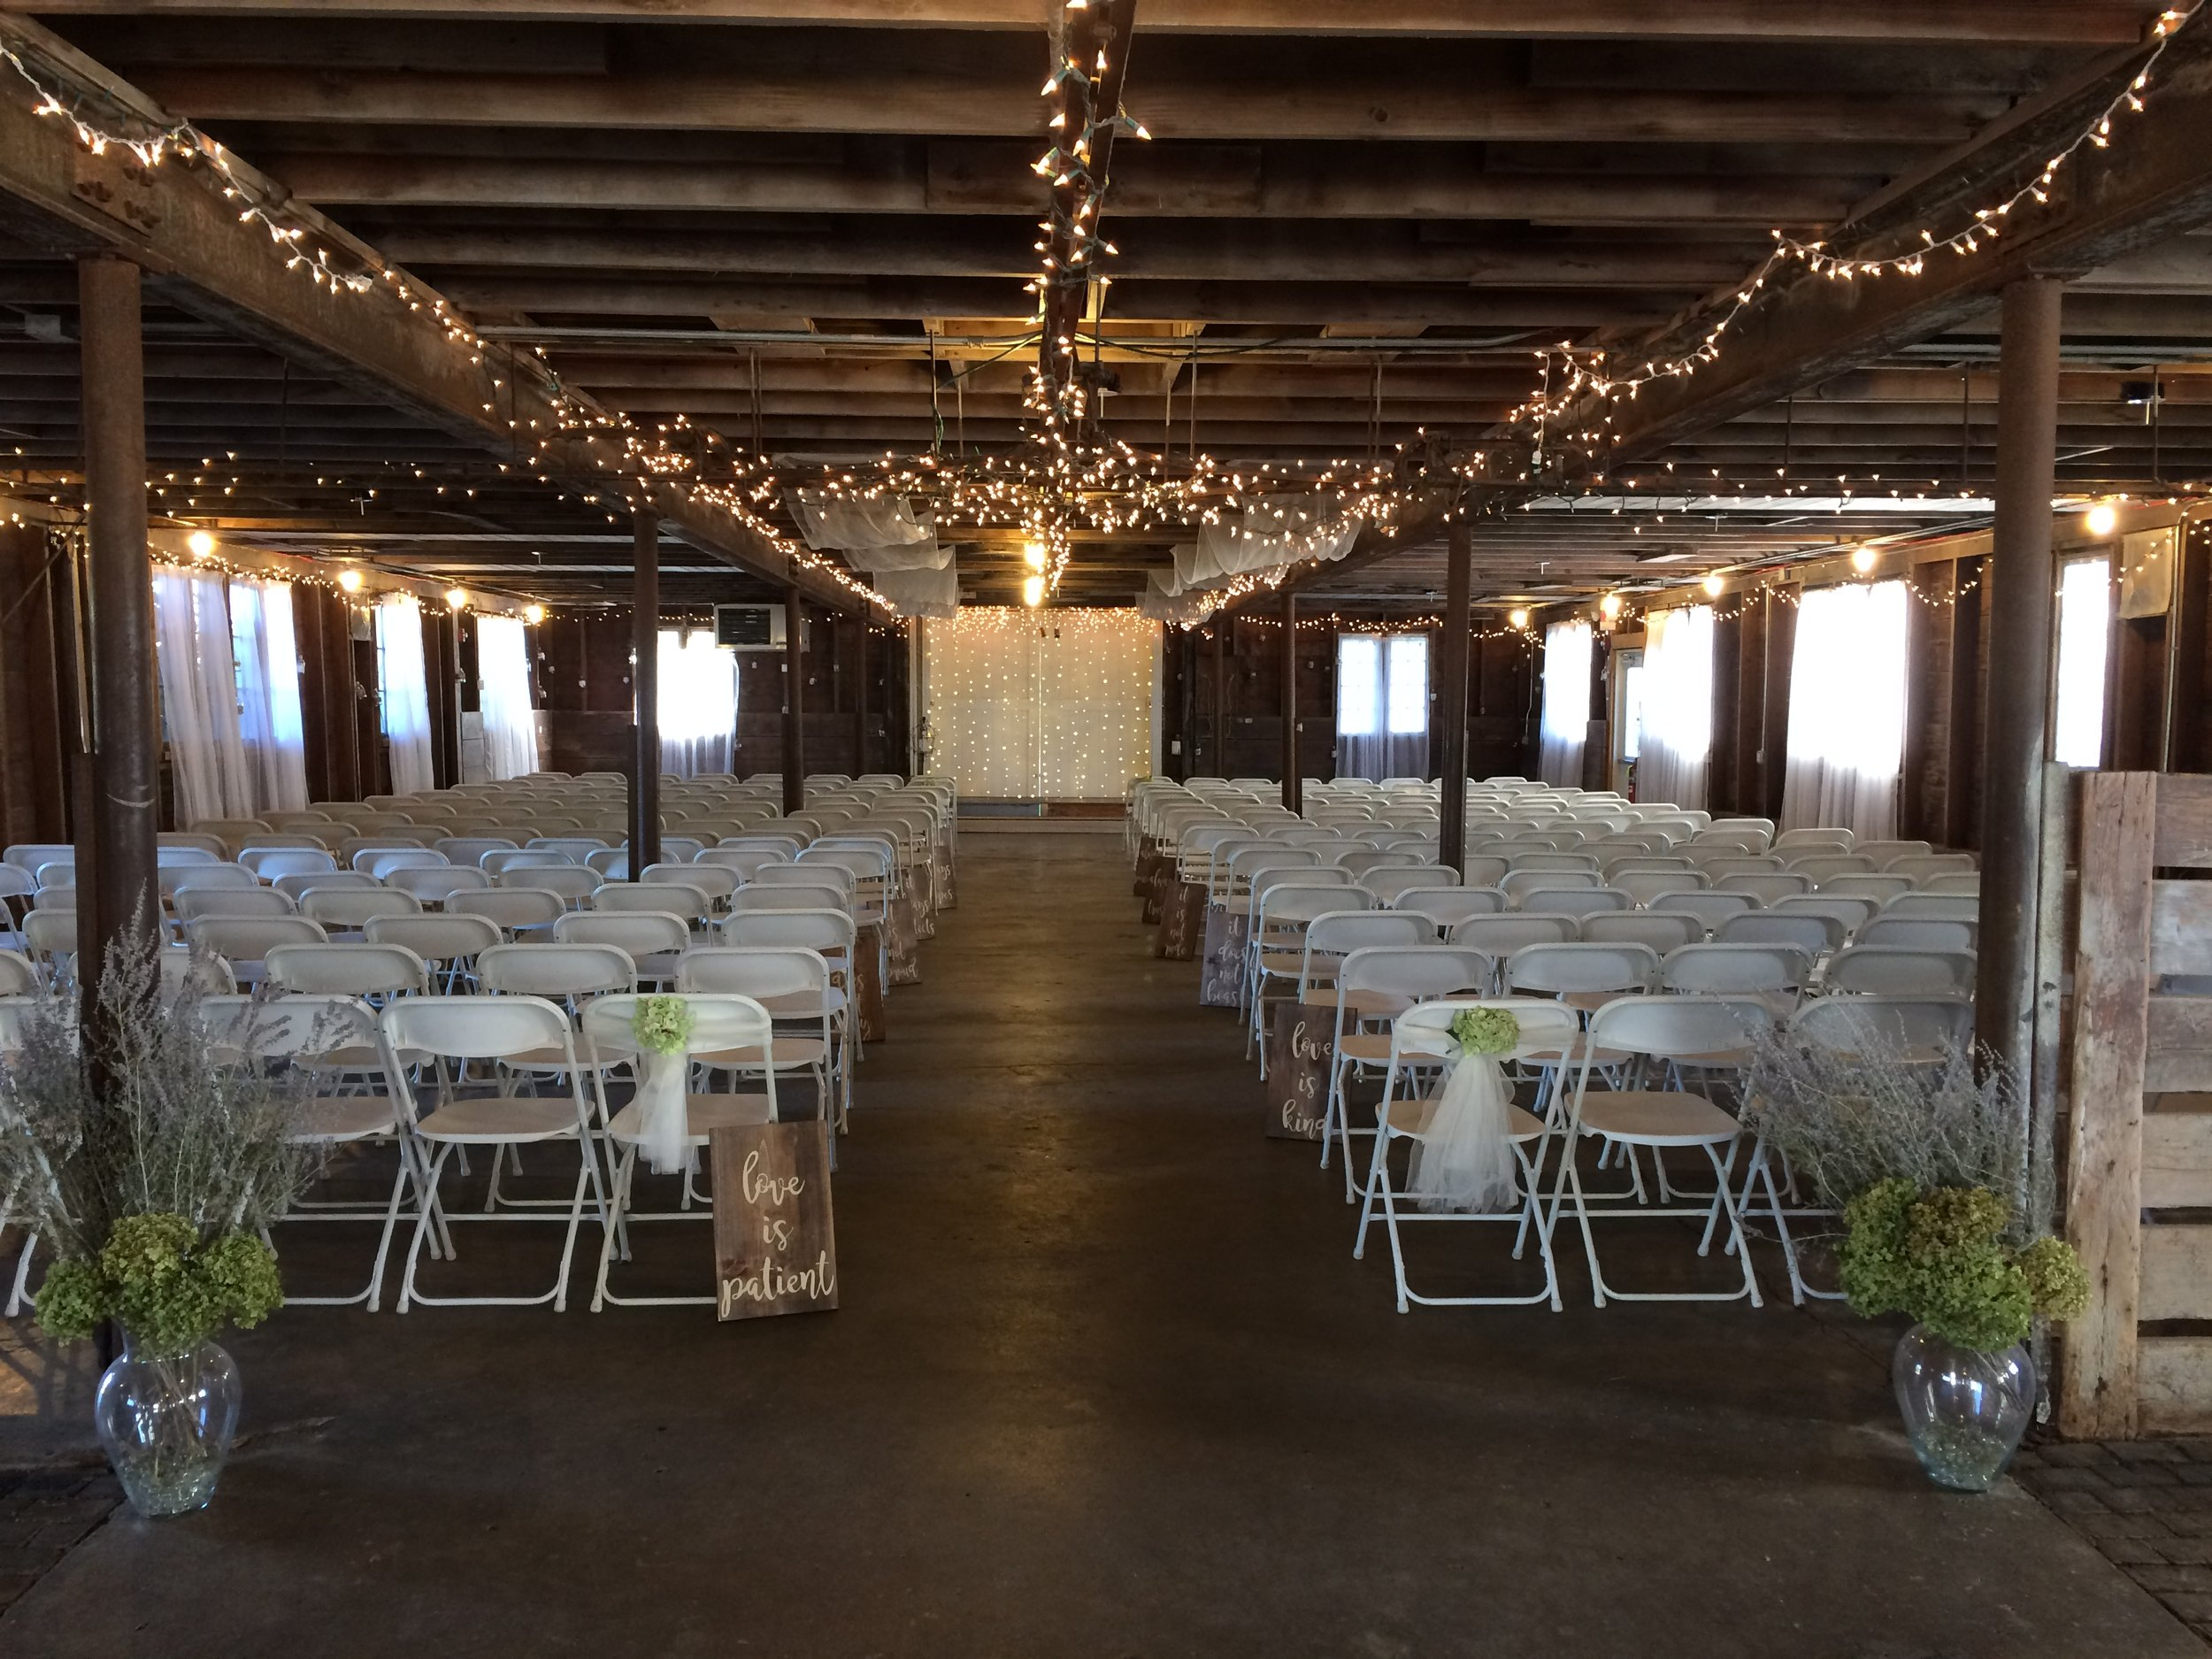 ceremony_barn setup.JPG